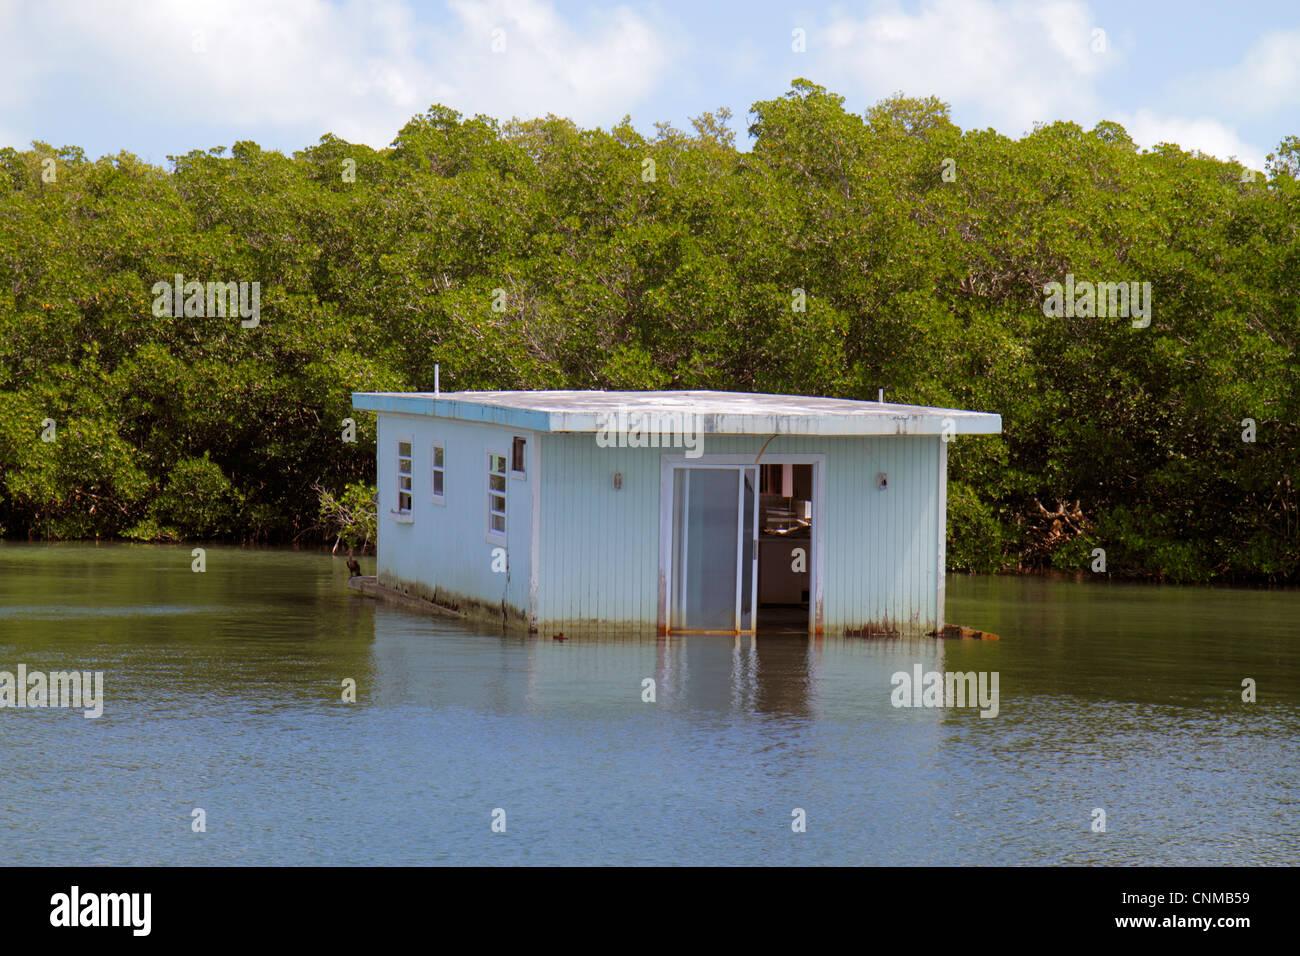 Traveling Houseboat Stock Photos & Traveling Houseboat Stock